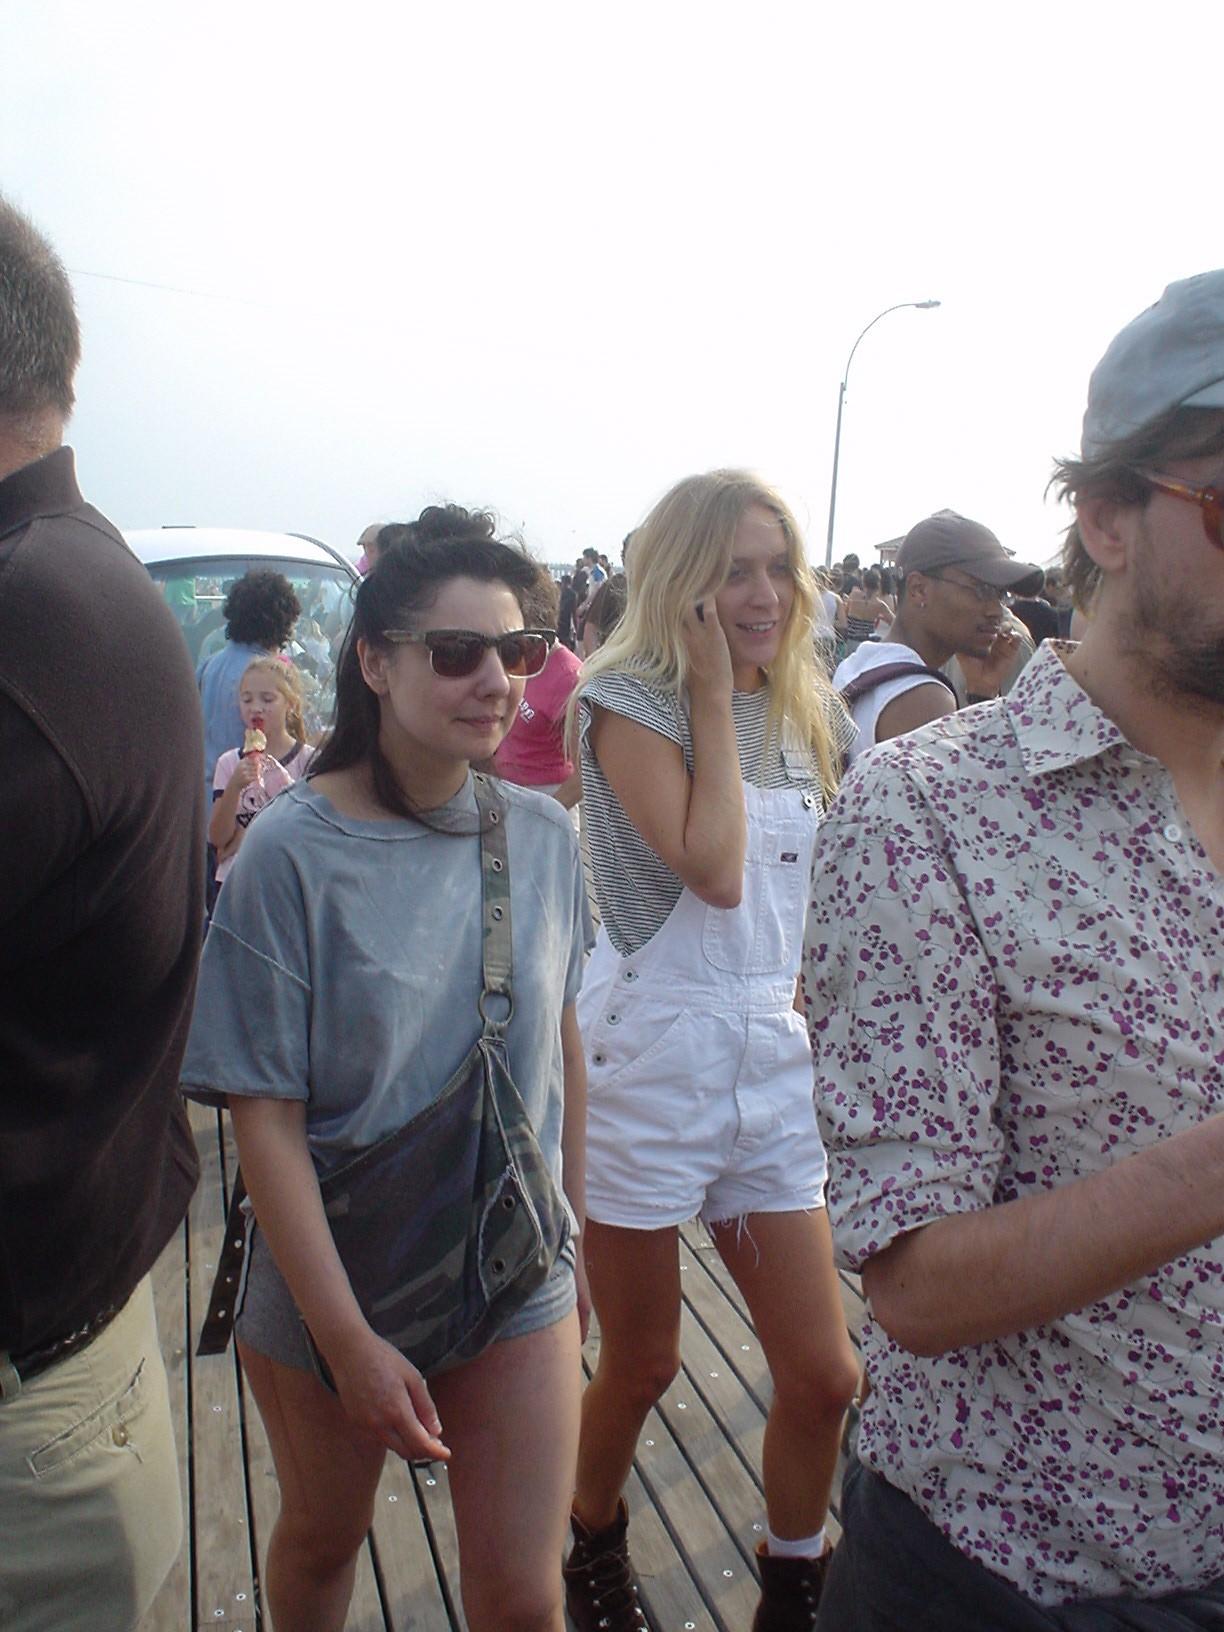 Chloe Sevigny on The Boardwalk at Coney Island